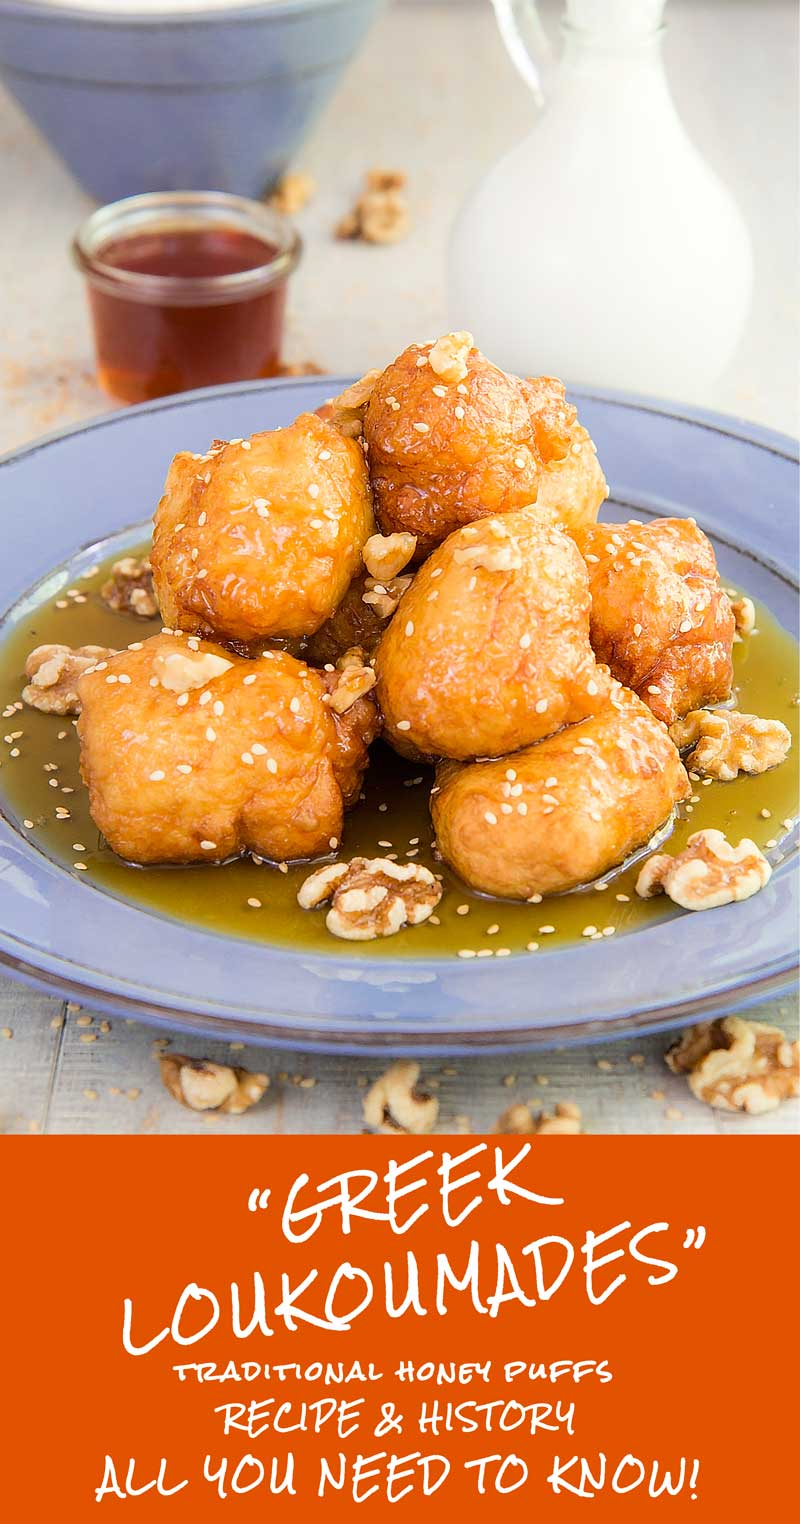 LOUKOUMADES - traditional greek honey puffs recipe & history